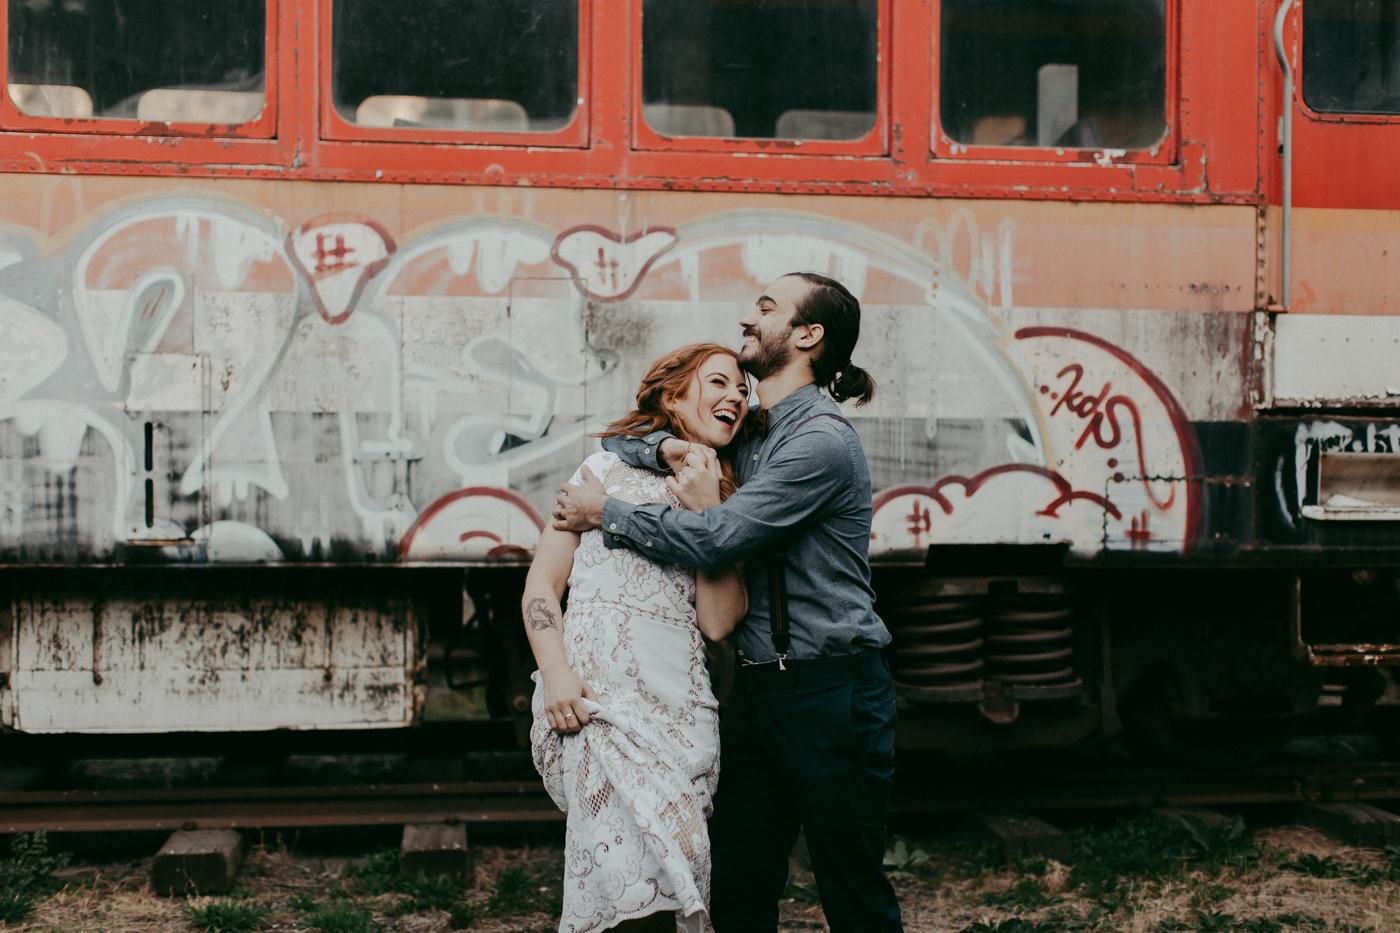 Jess & Dre - Destination Elopement Inspiration - Samantha Heather Photography-72.jpg